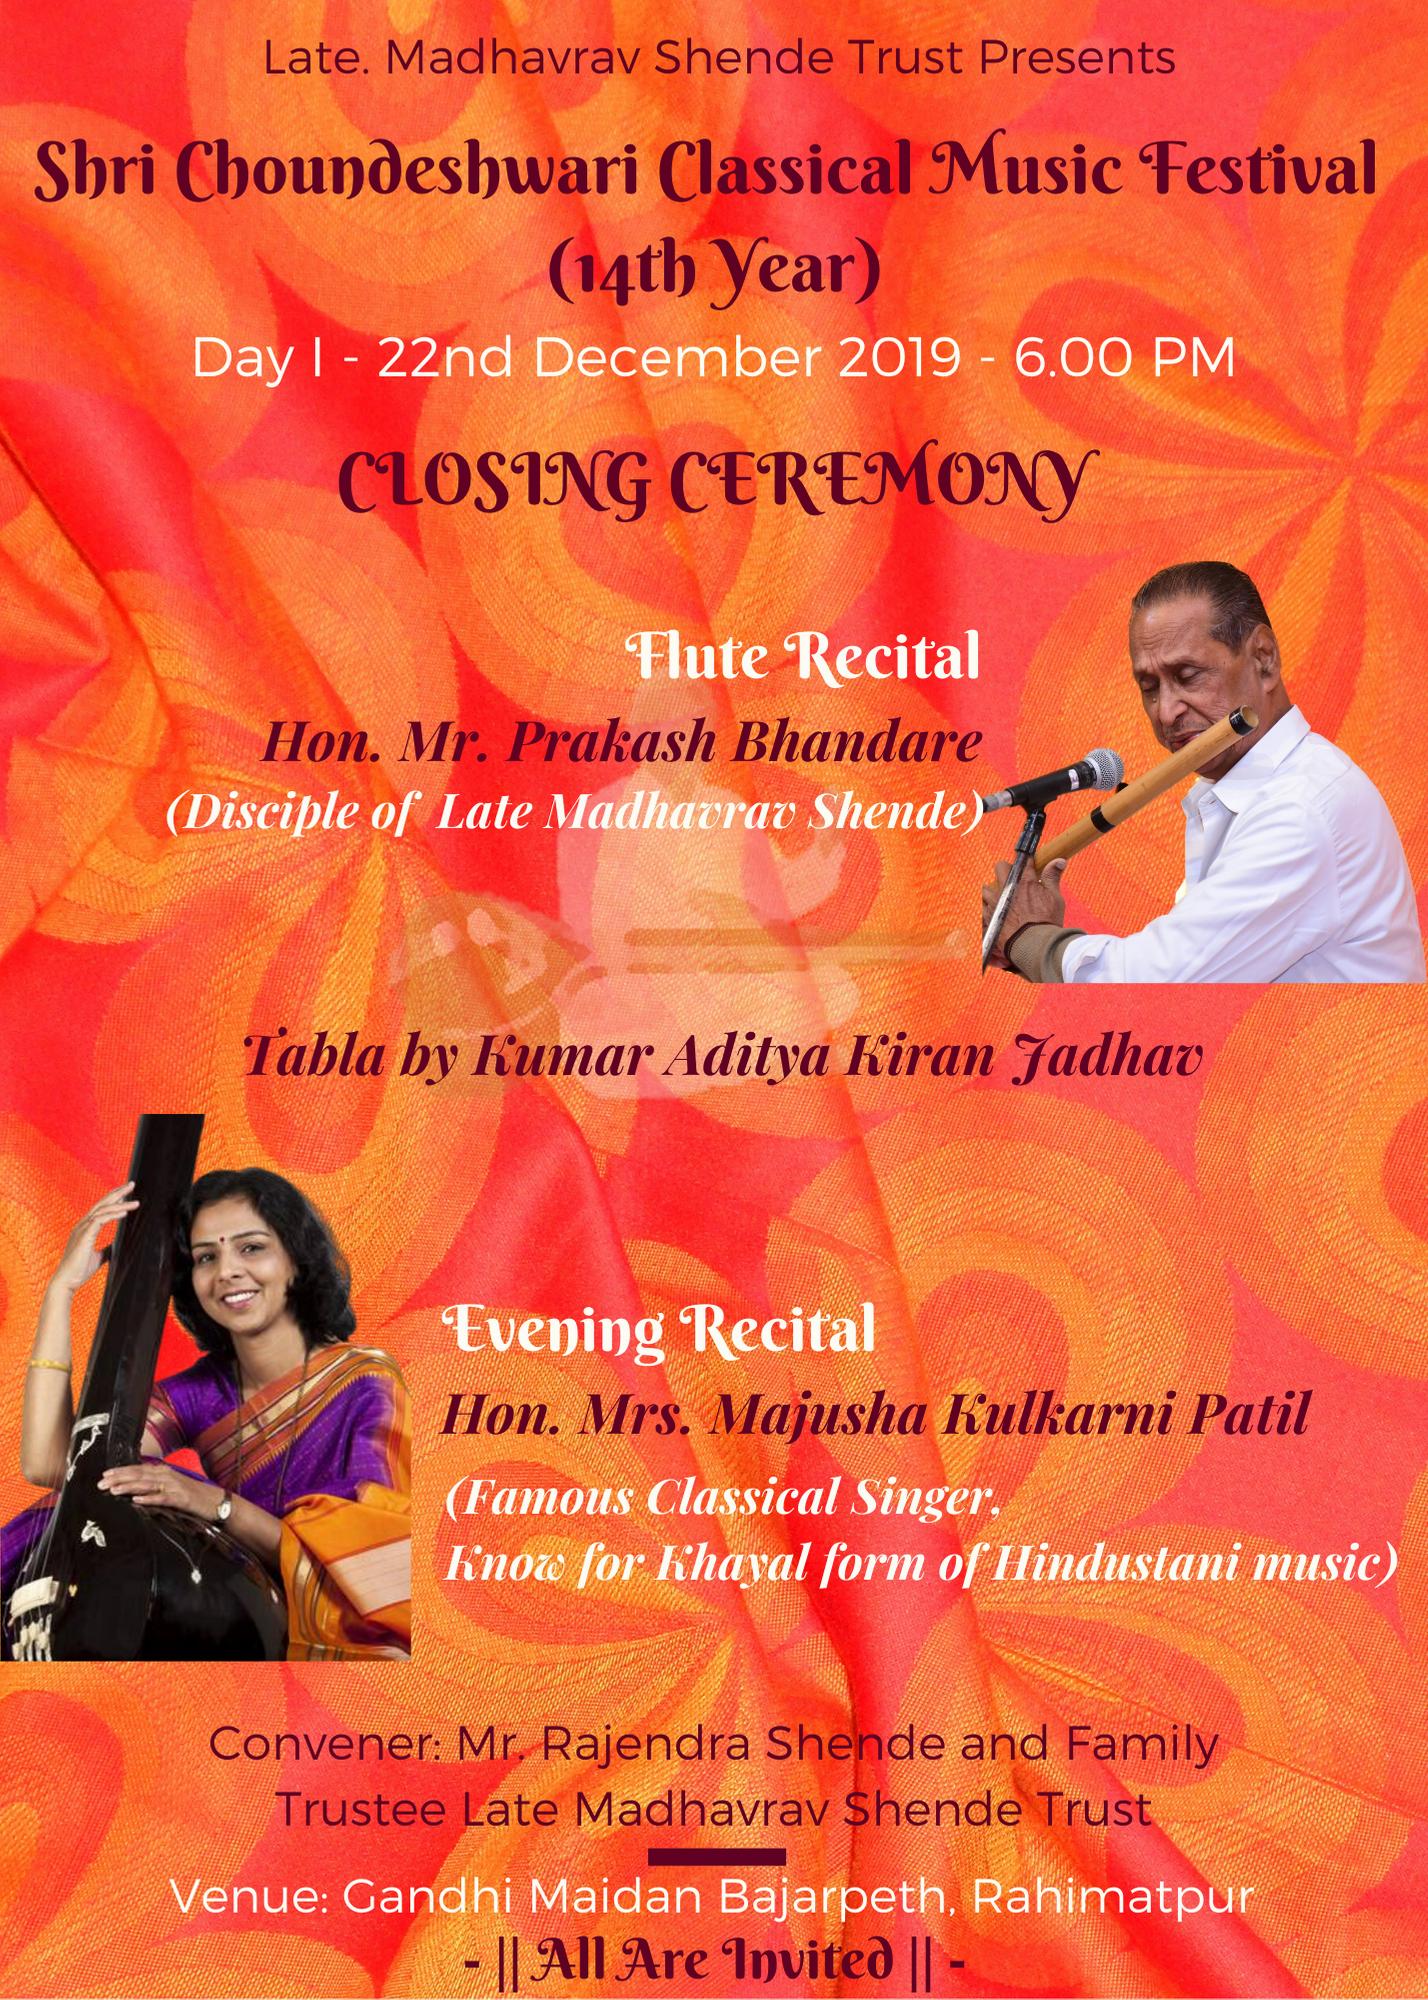 RS - Shri Choundeshwari Classical Music Festival 2019 - Invitation  Day 2